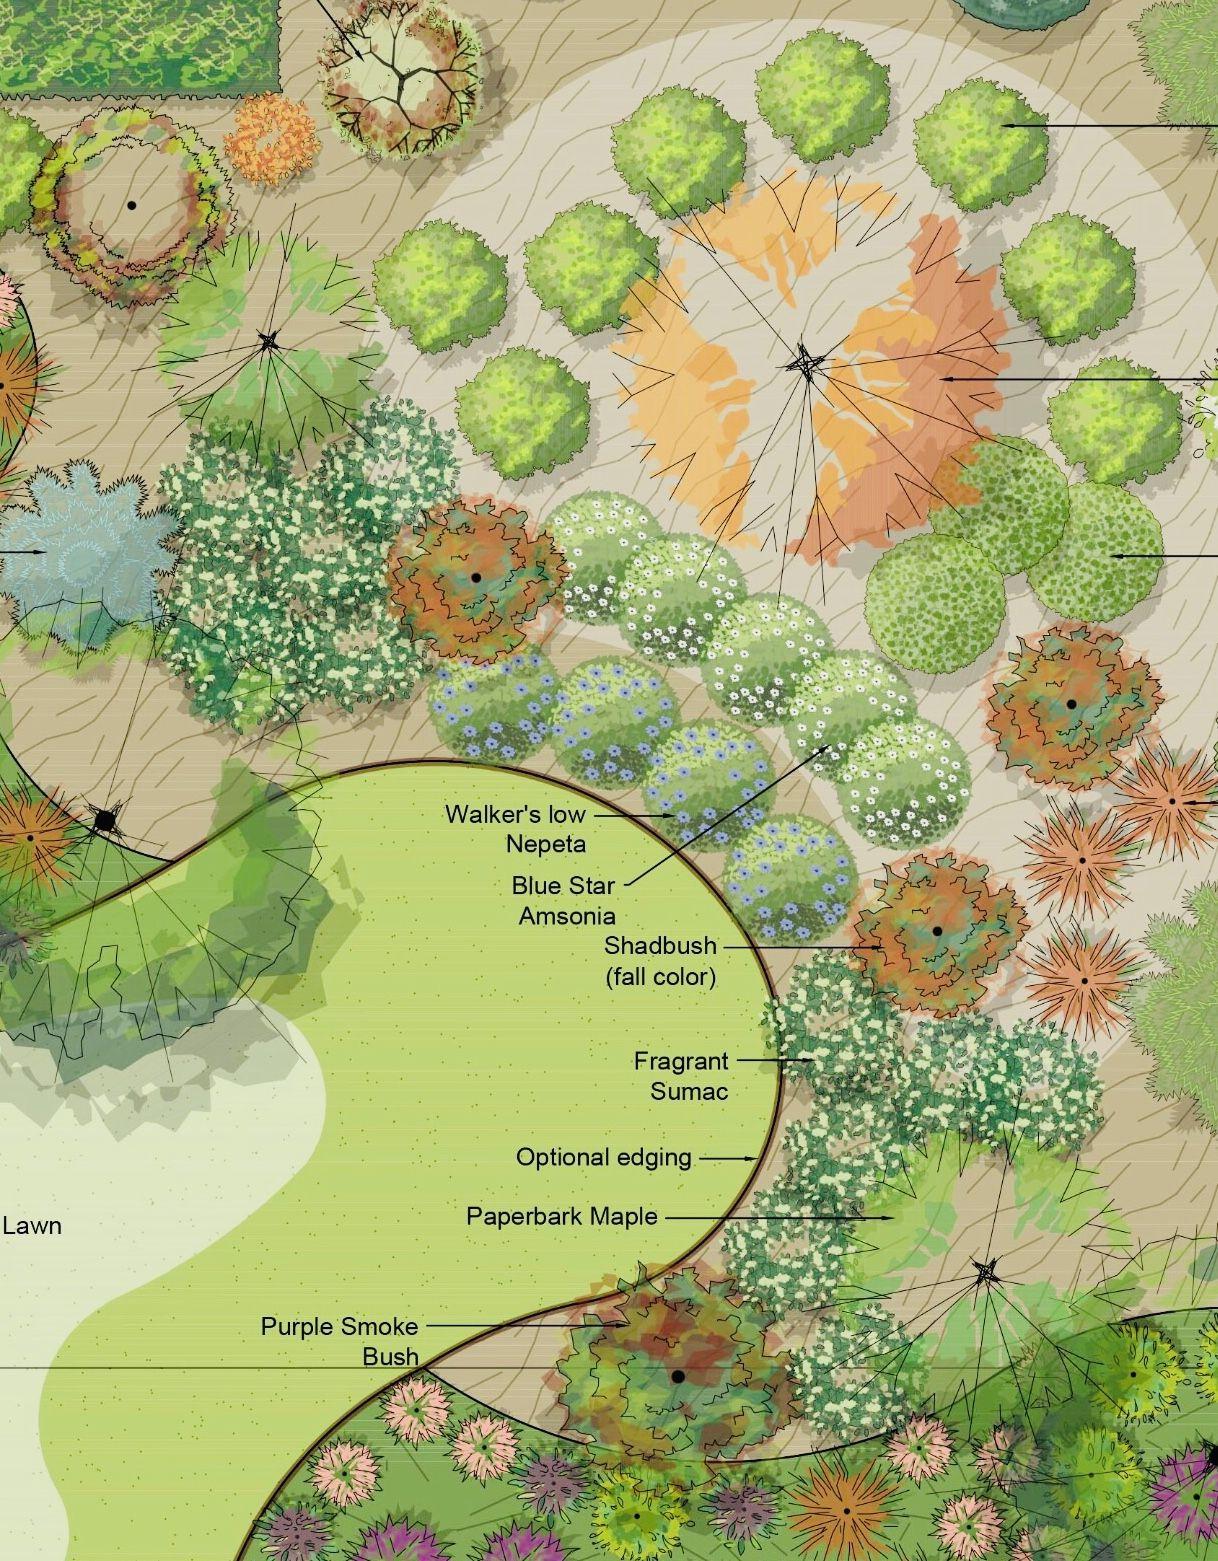 In The Landscape In 2020 Landscape Smoke Bush Missouri Botanical Garden